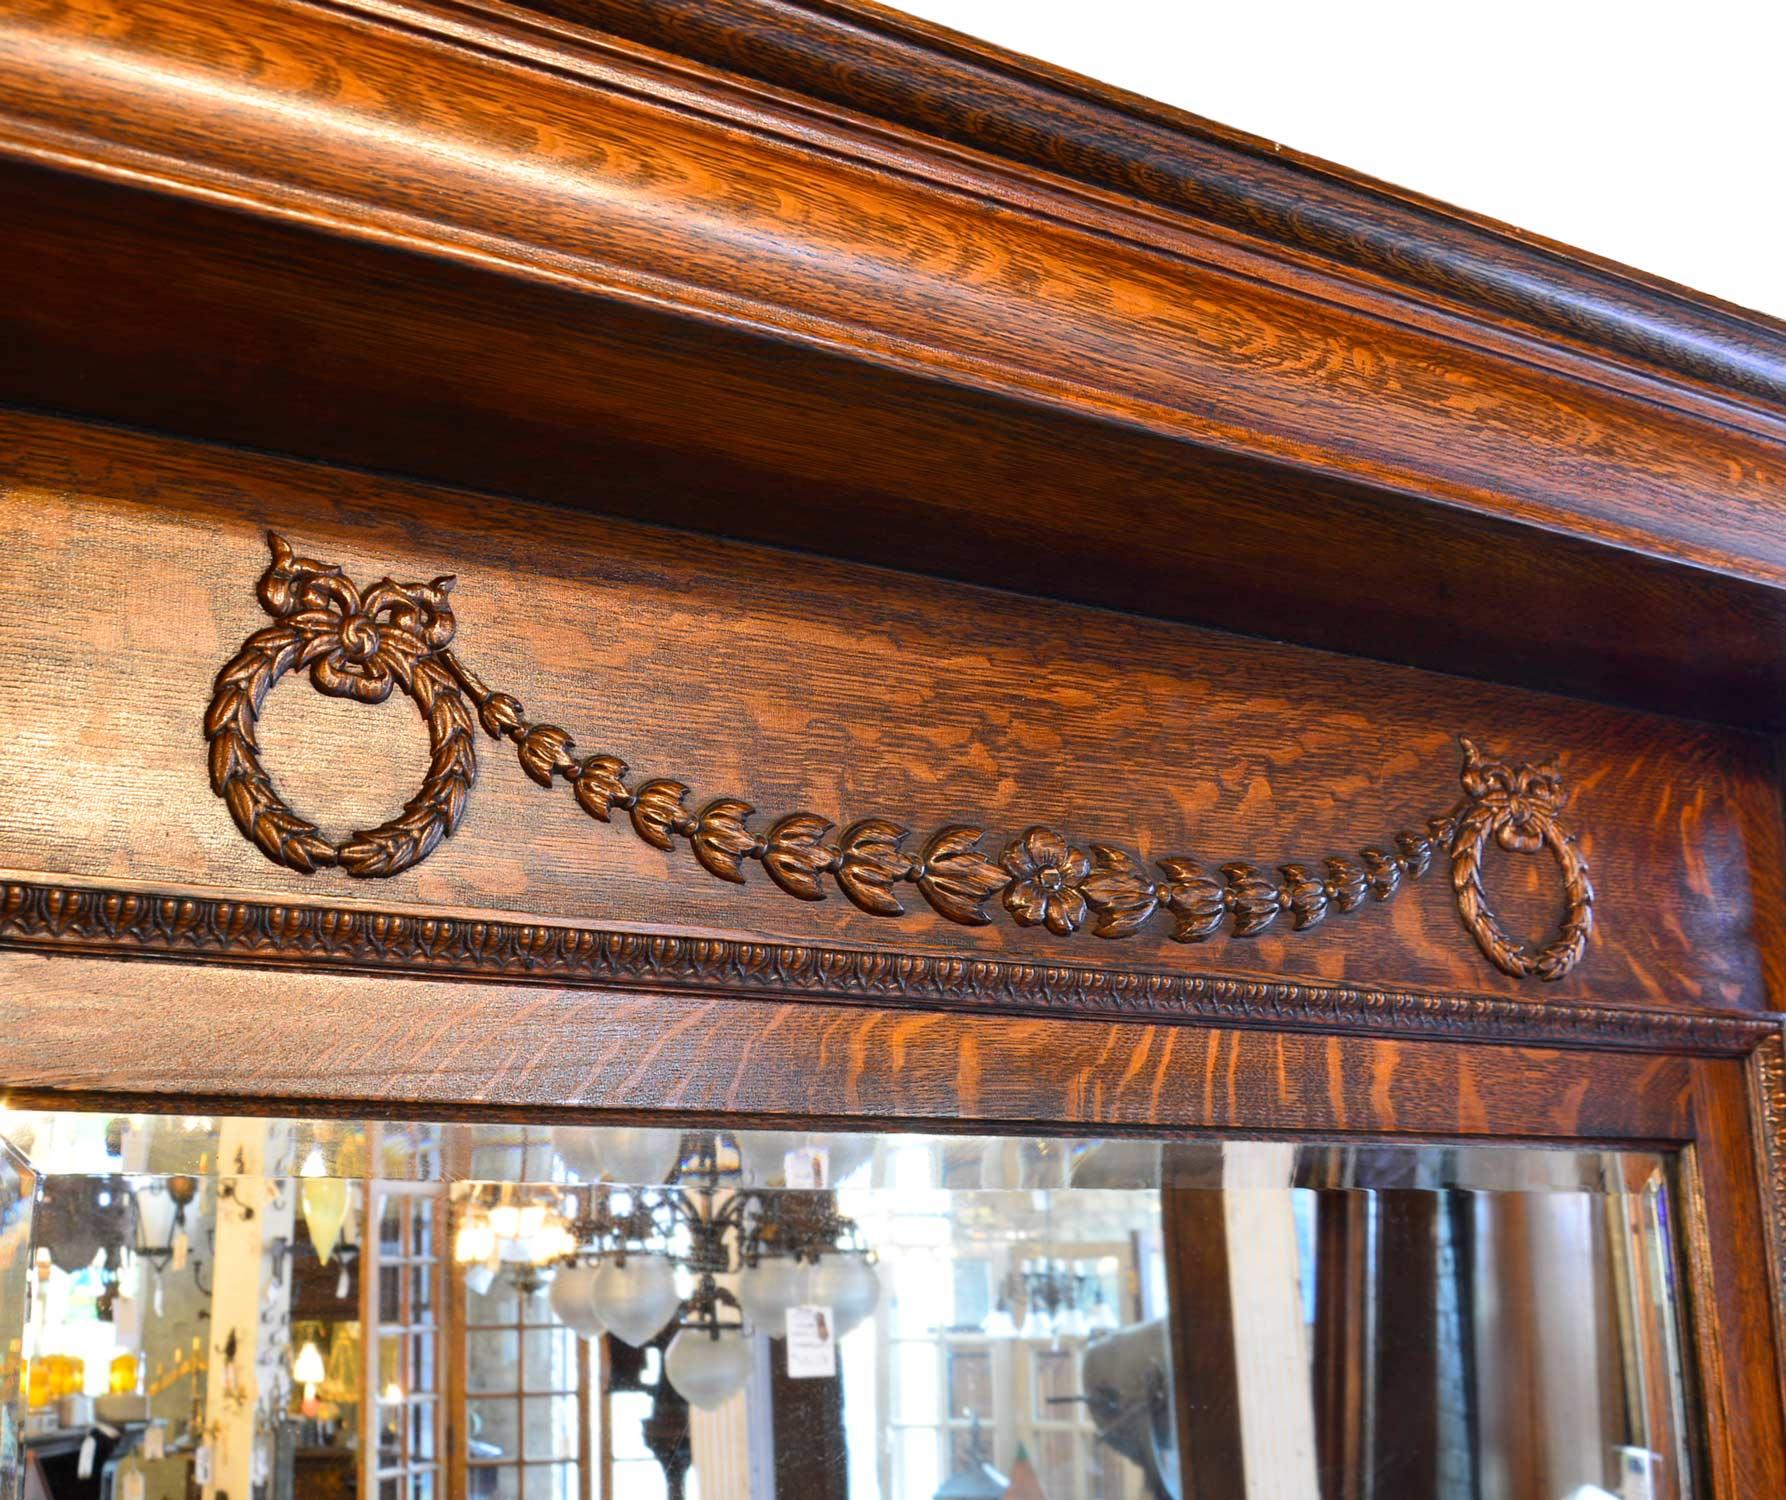 46007-oak-pier-mirror-top-detail.jpg